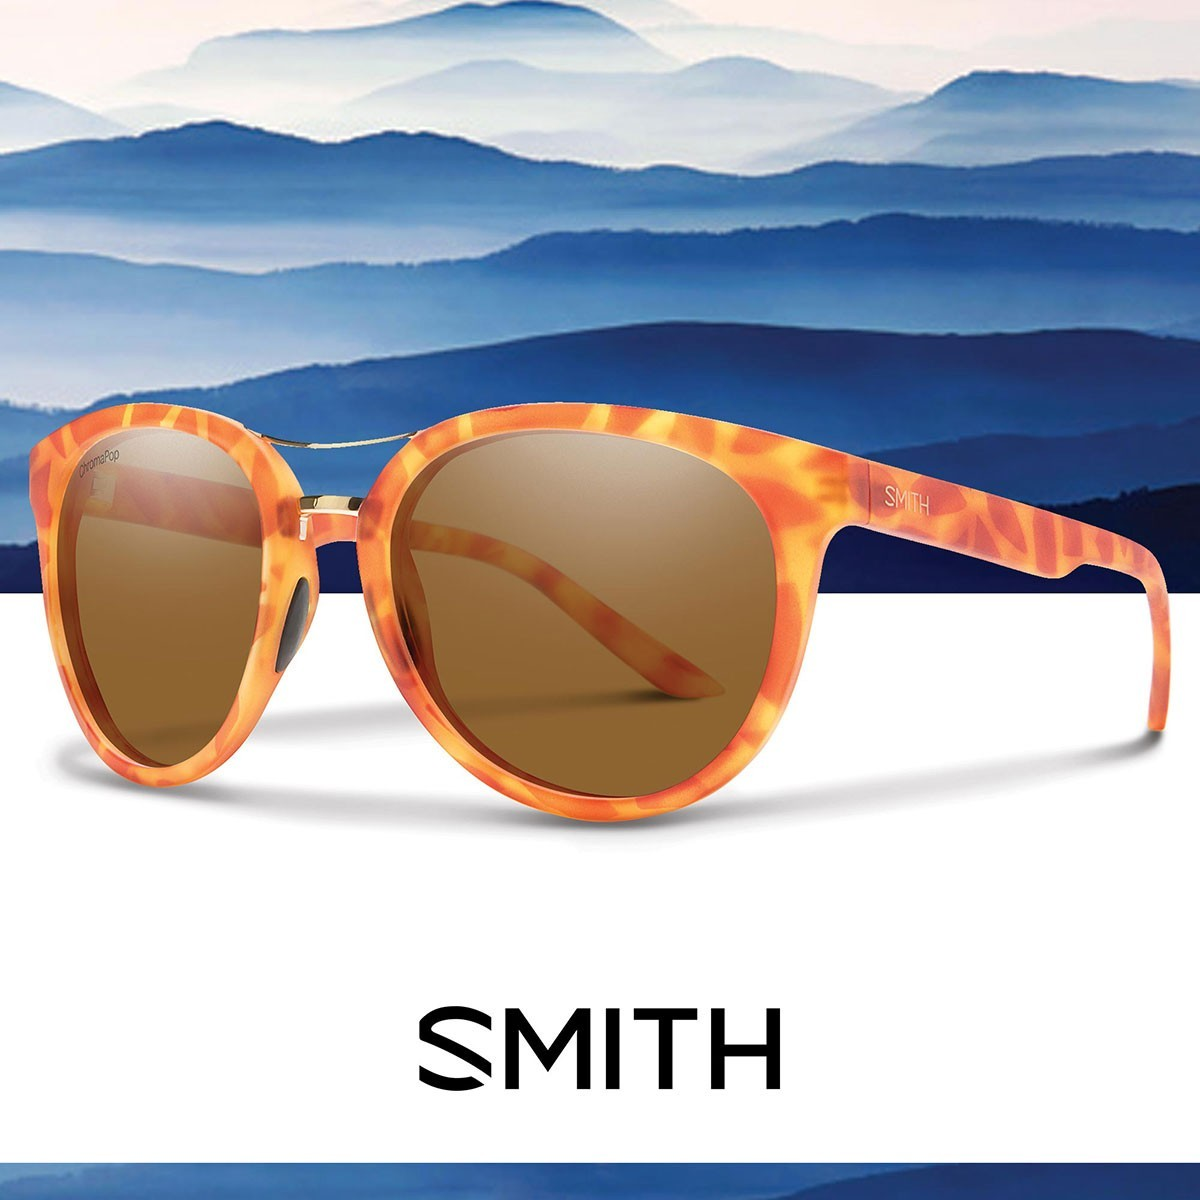 SMITH BRIDGETOWN Matte Golden Tort CHROMAPOP - Изображение - AQUAMATRIX